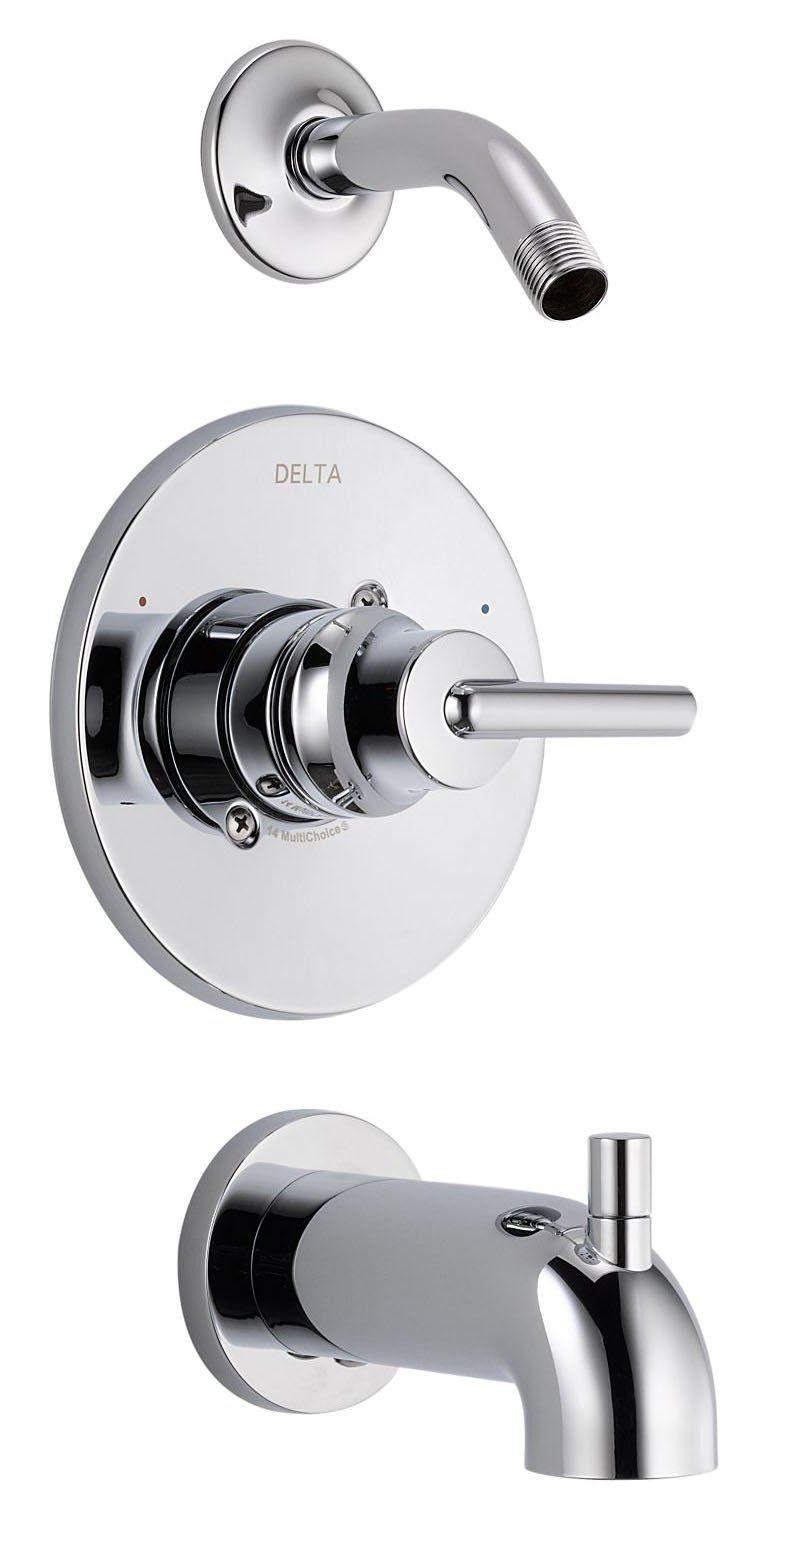 Delta Faucet T14459 Lhd Trinsic 14 Series Tub Shower Trim With Less Showerhead Chrome Shower Tub Tub And Shower Faucets Shower Faucet